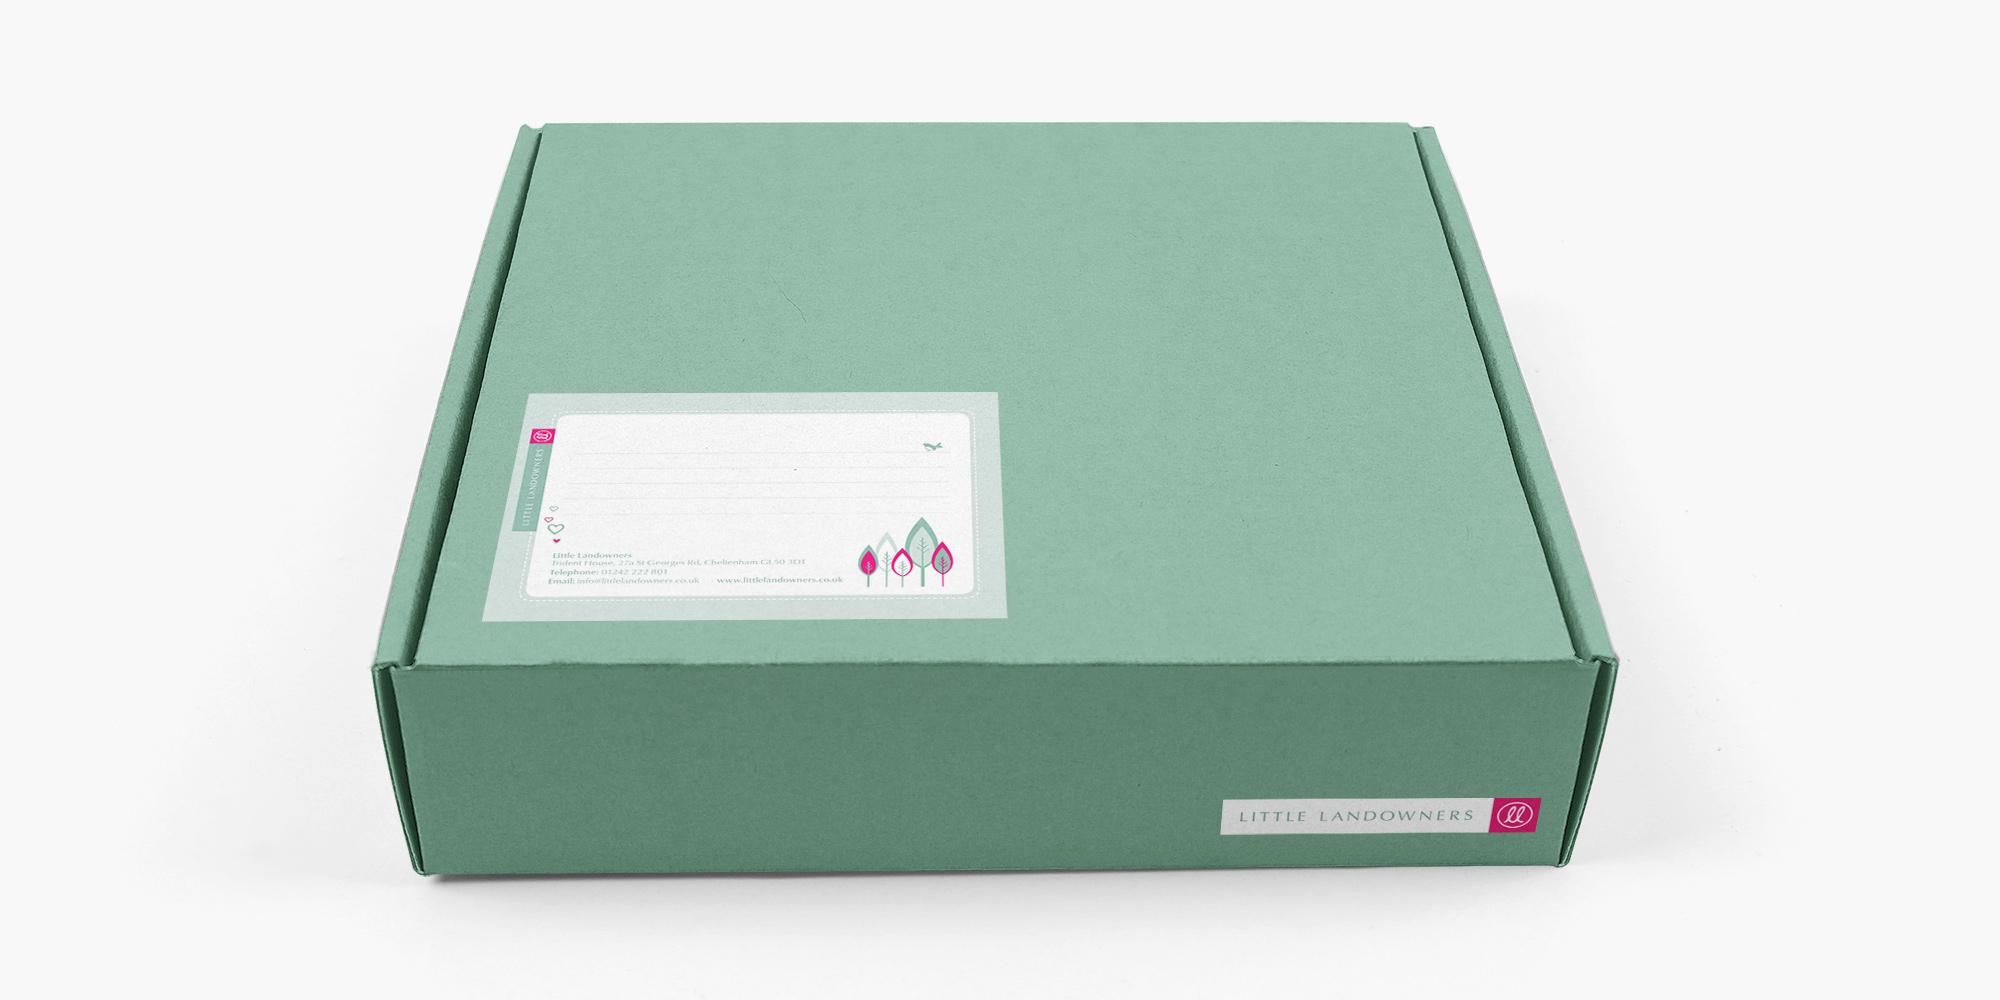 Little Landowners Packaging Design